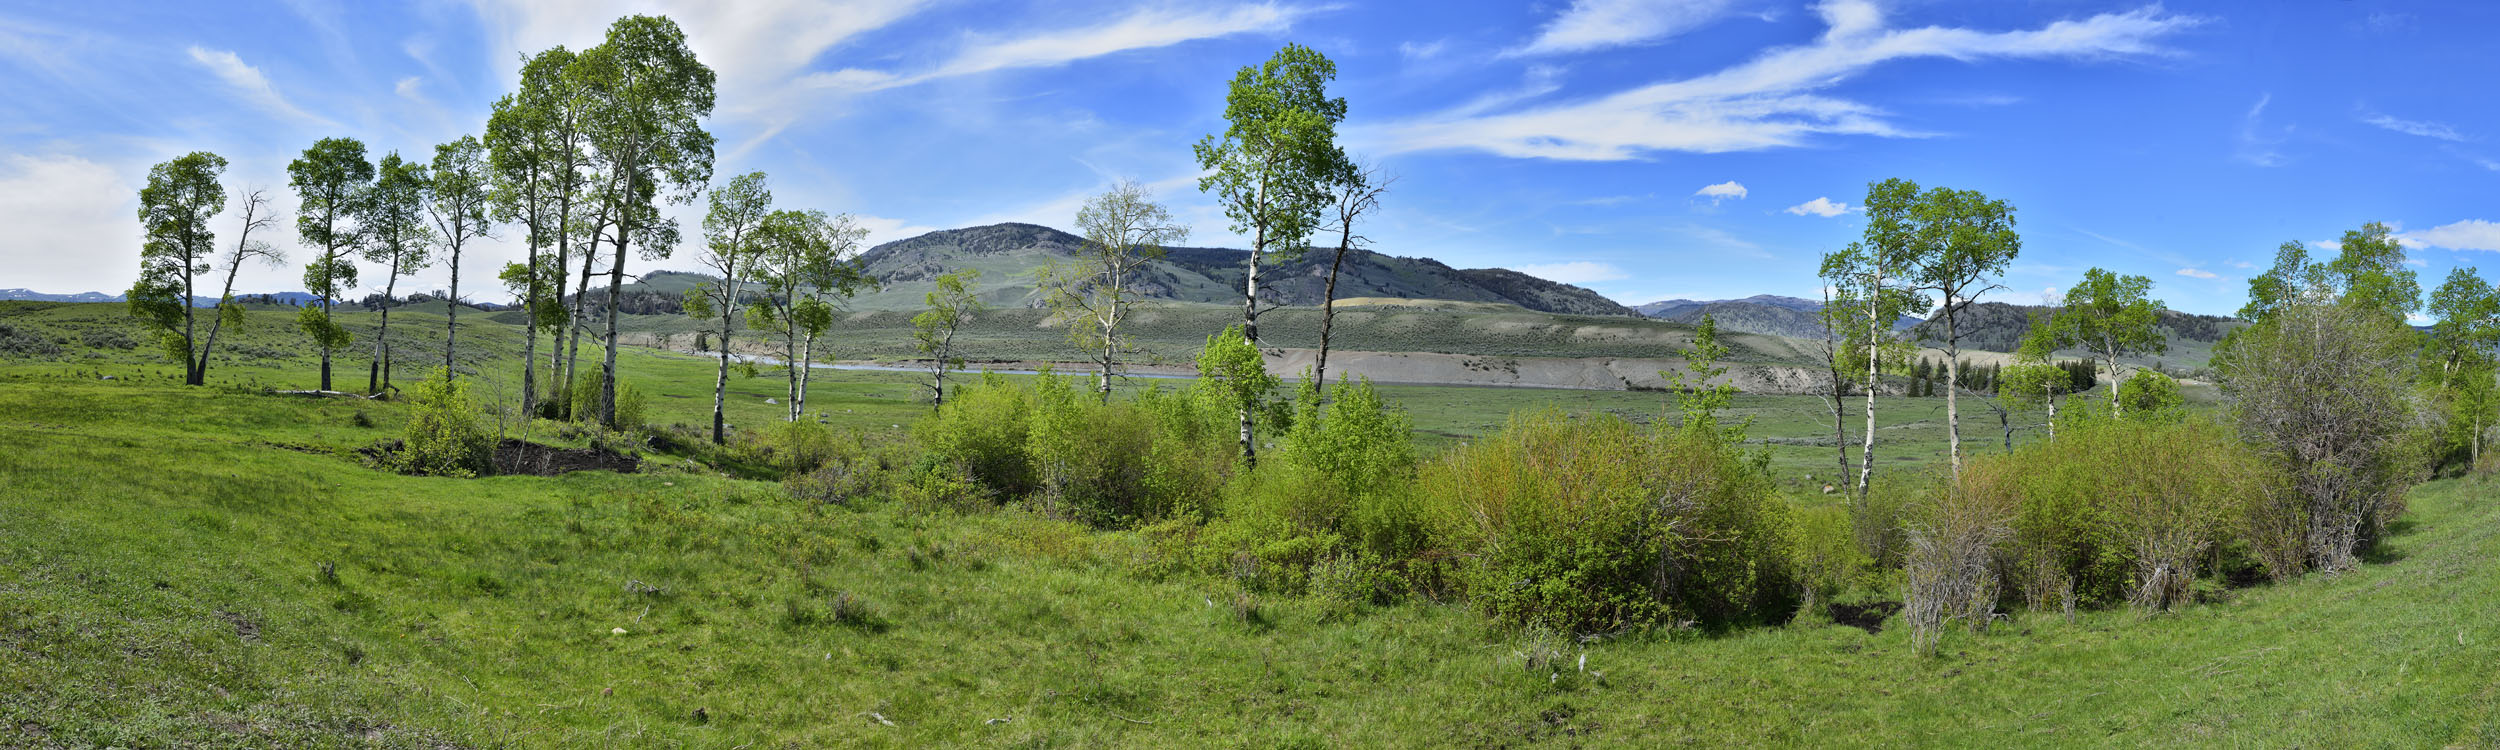 Larimar Valley, Yellowstone NP